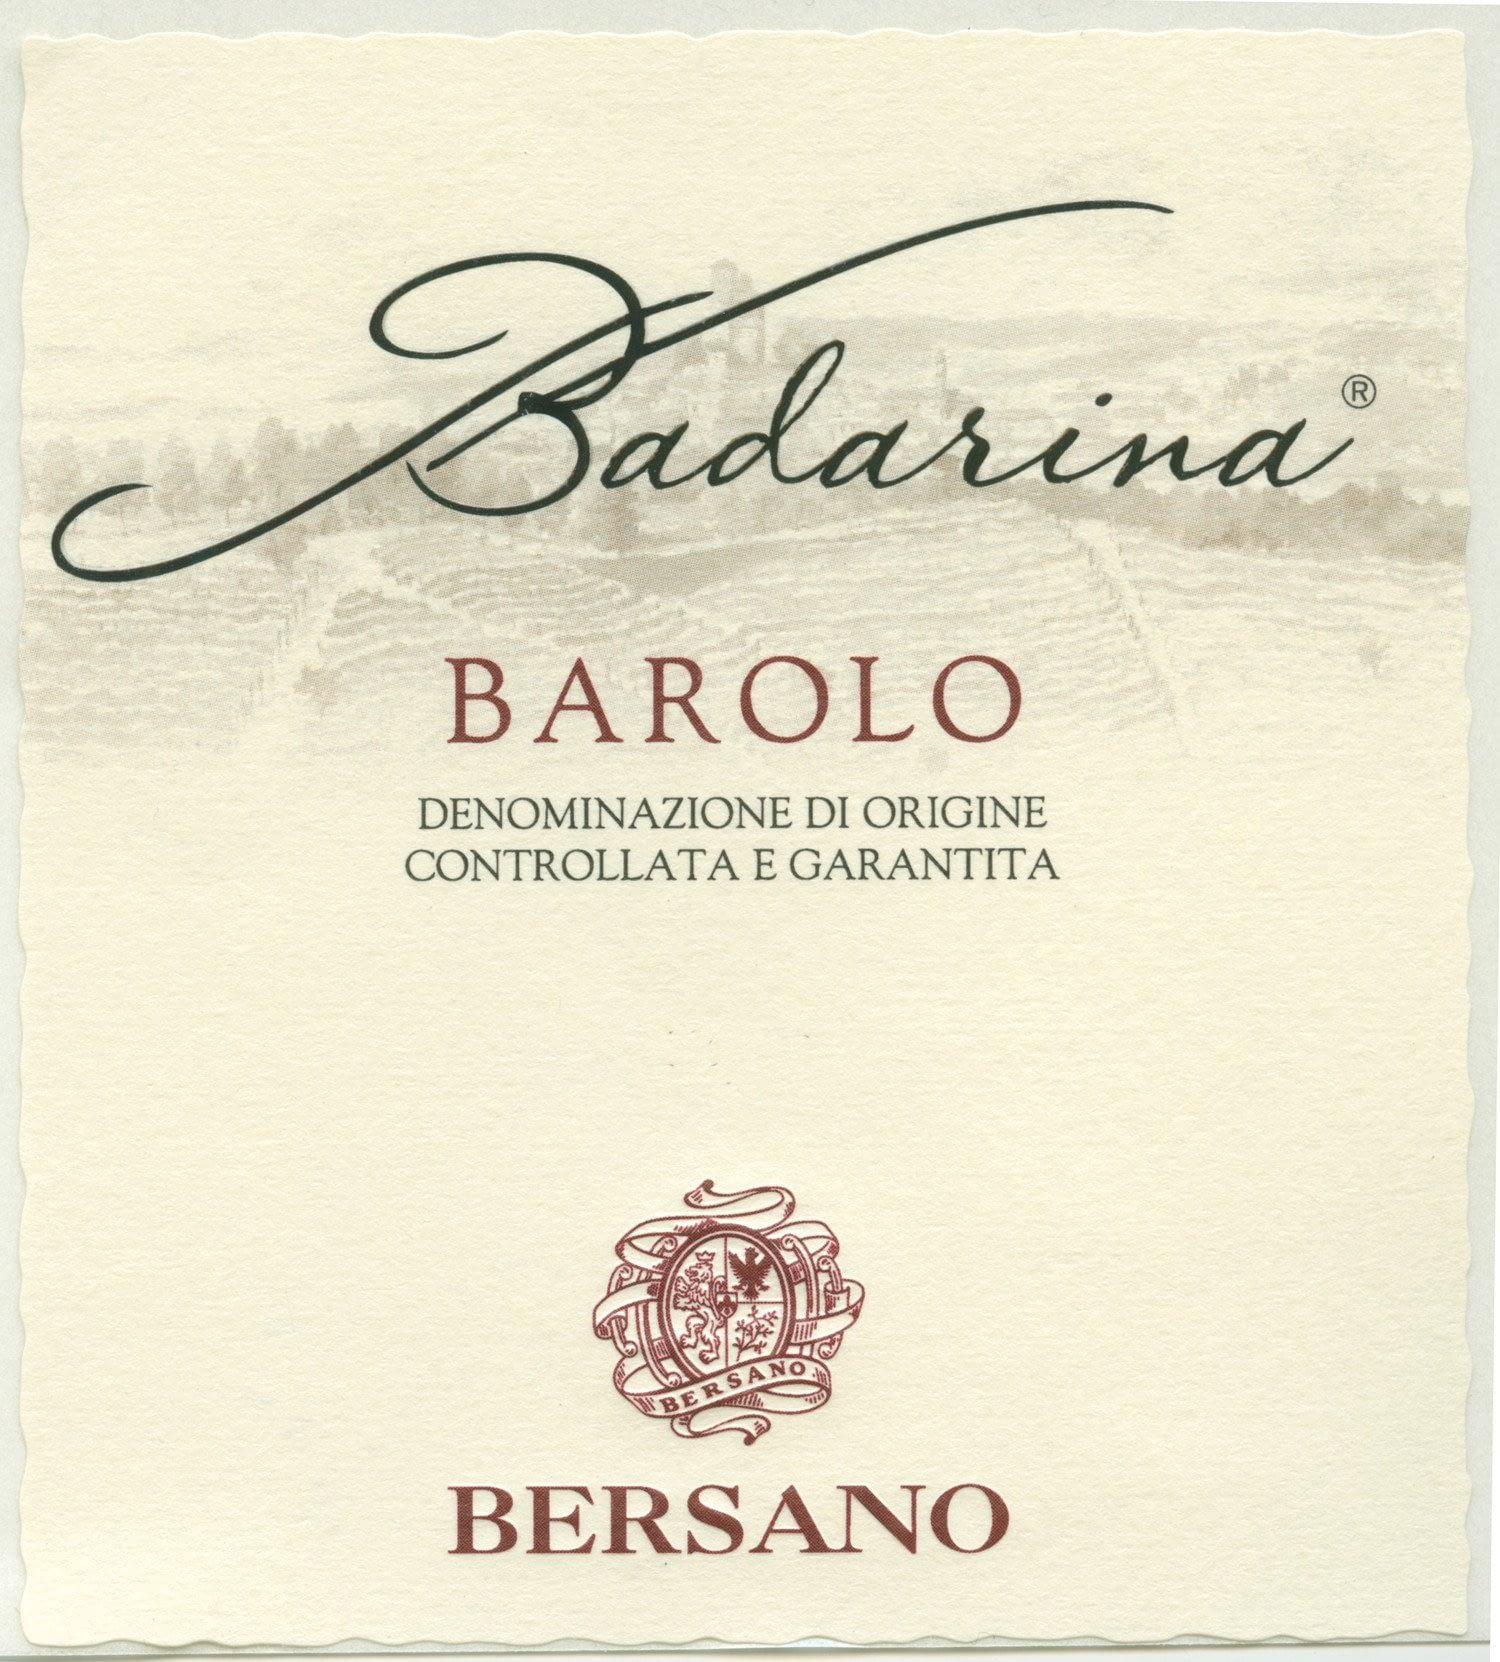 Bersano Barolo